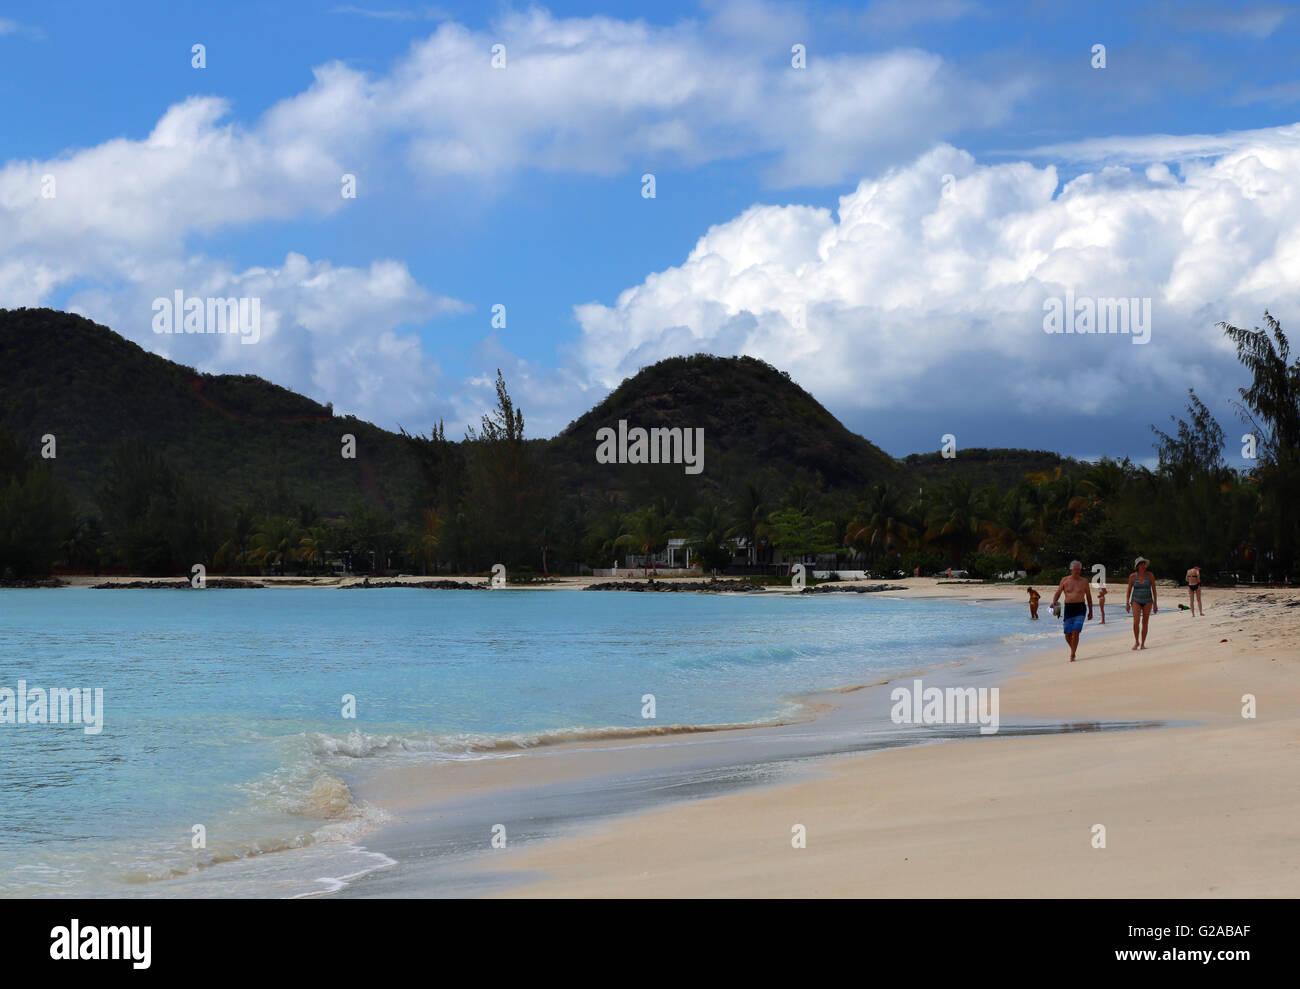 Jolly Bay beach, Antigua, Caribbean - Stock Image